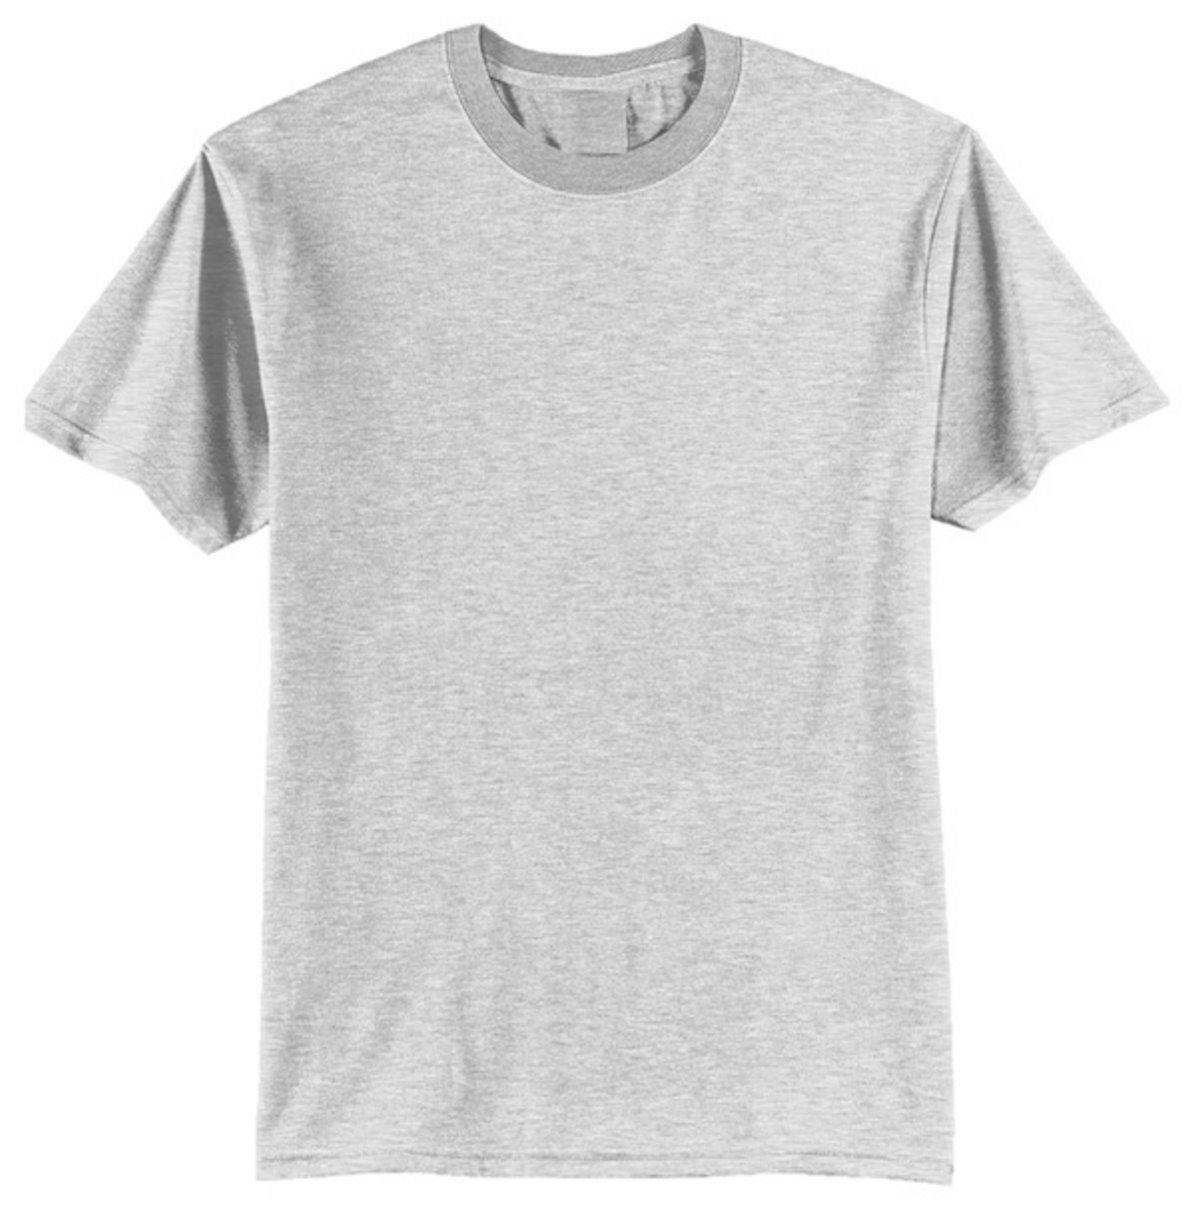 big mens t shirt tee polo king size 3xl 4xl 5xl 6xl twin pack. Black Bedroom Furniture Sets. Home Design Ideas